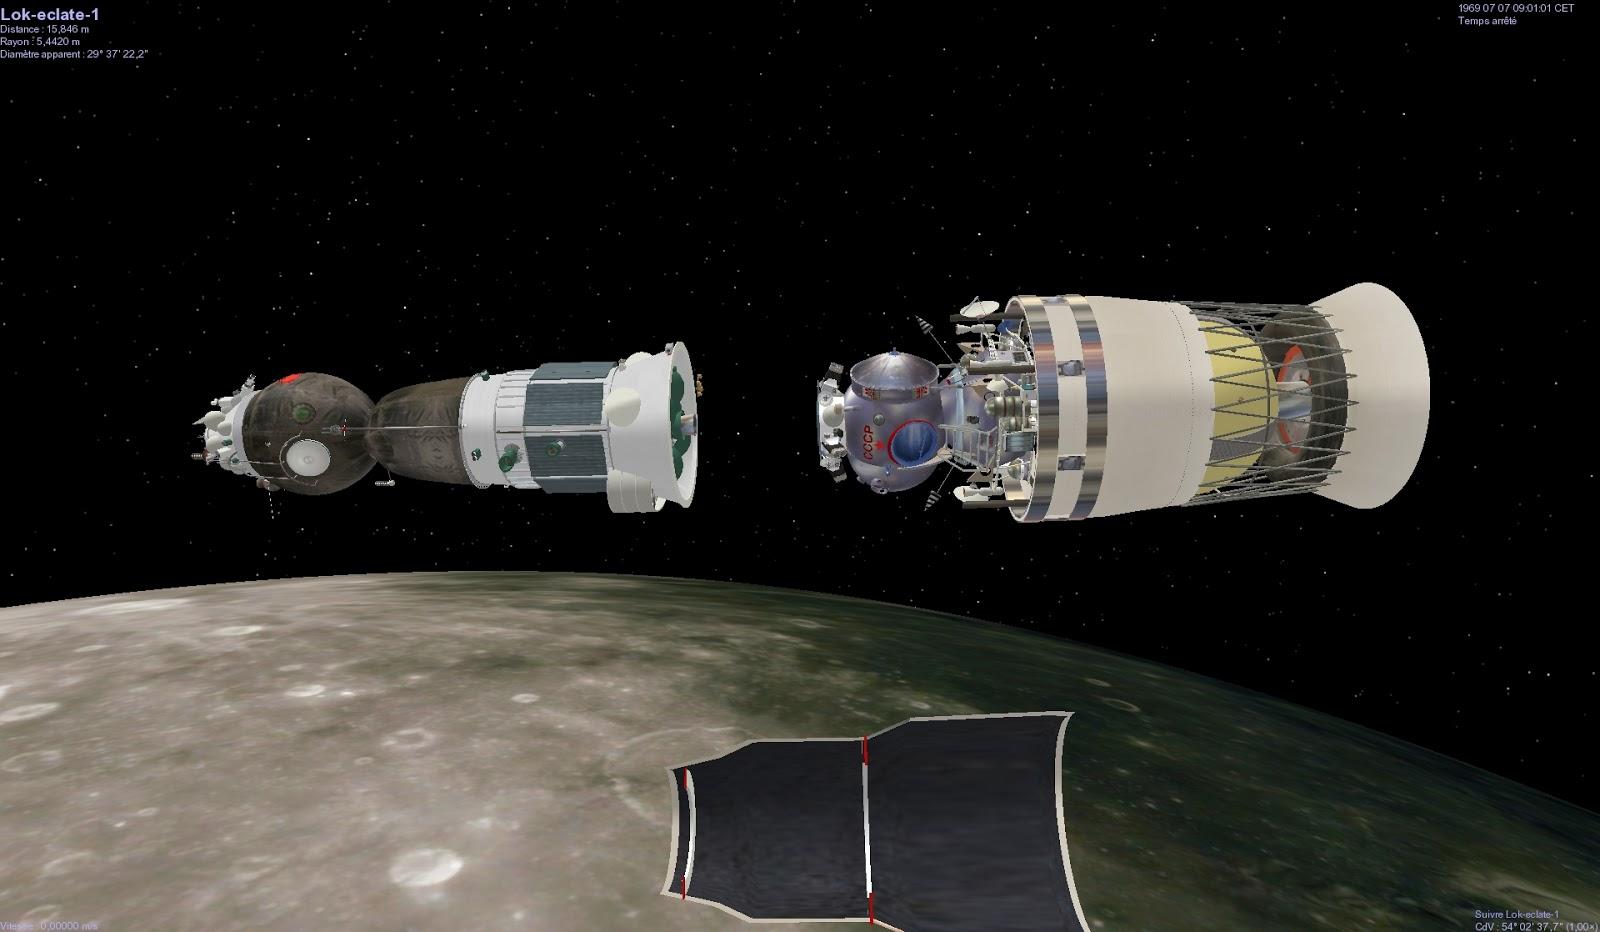 soviets moon landing rockets - photo #31